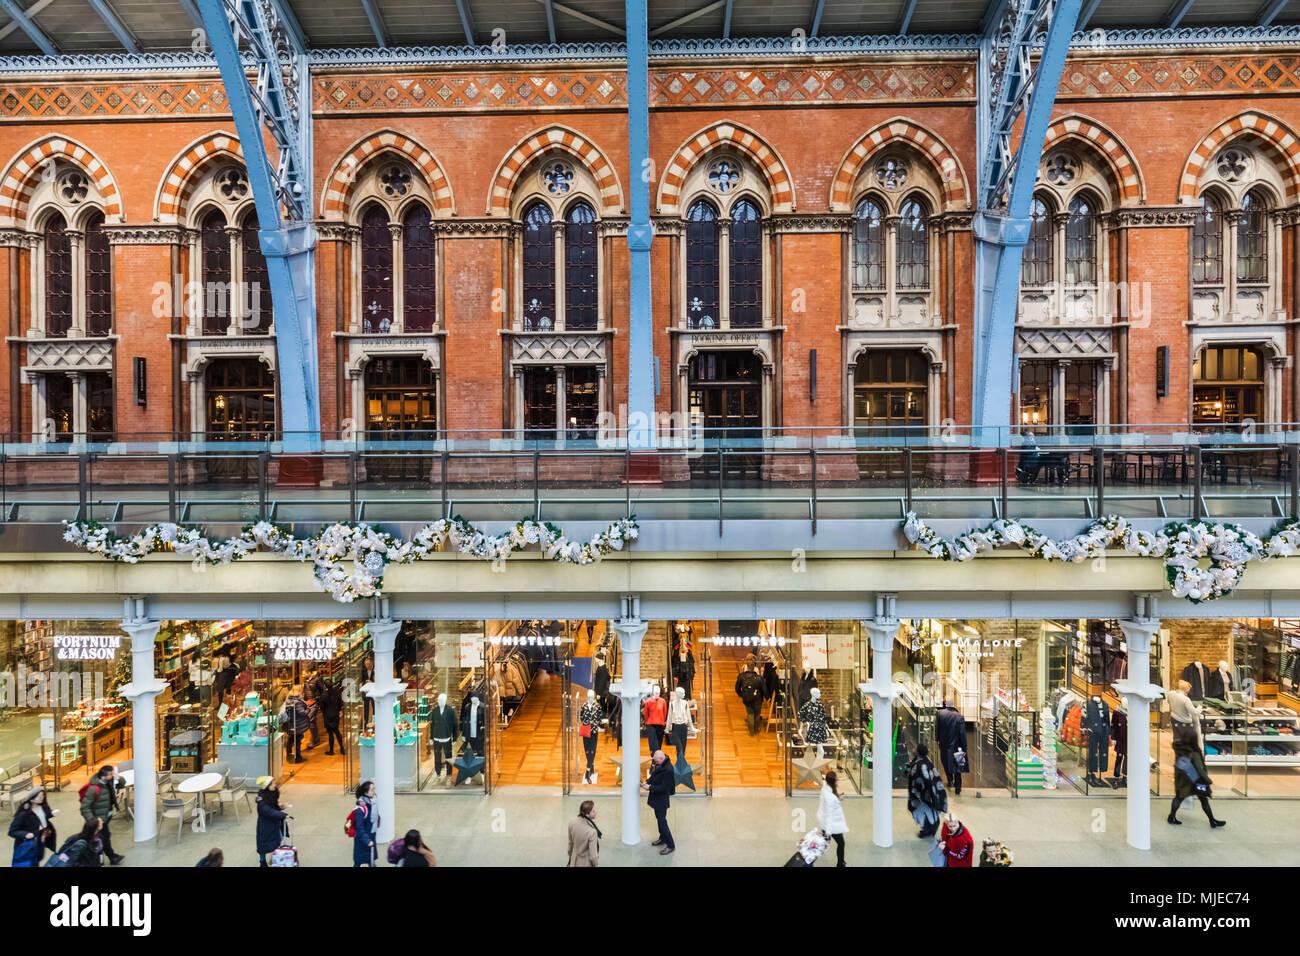 England, London, St Pancras International Station, Shopping Mall - Stock Image